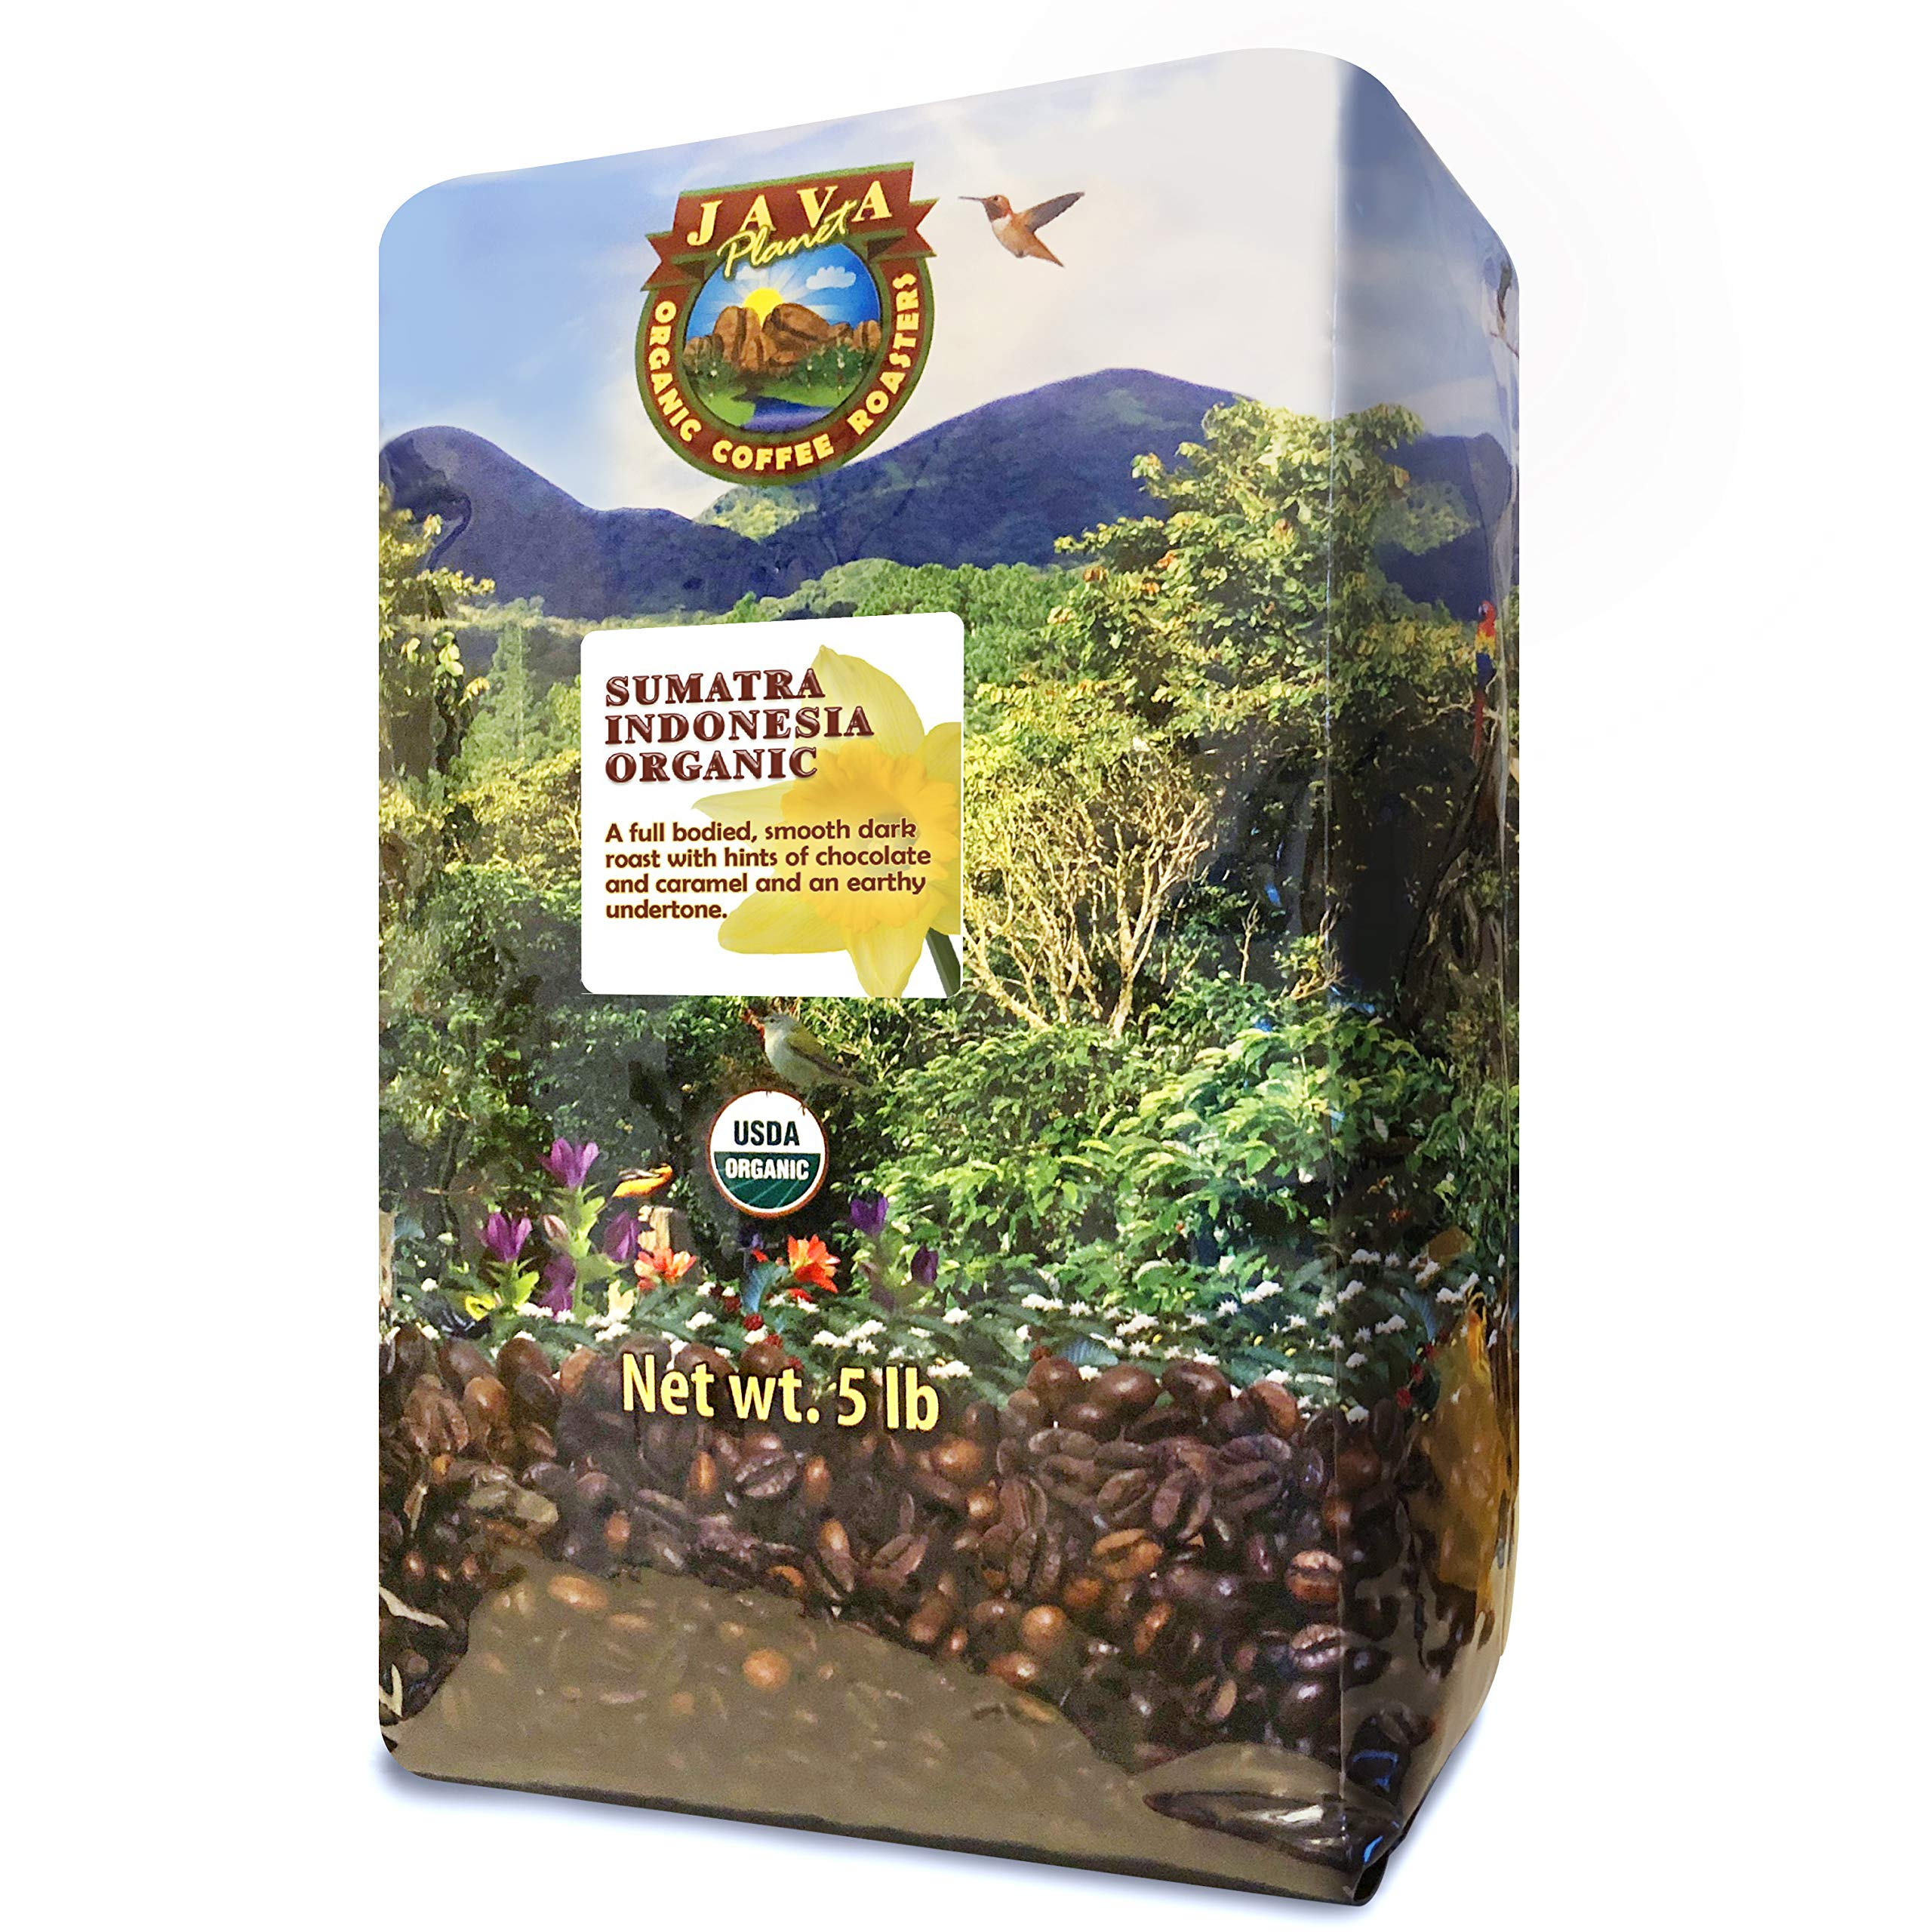 Java Planet, Organic Coffee Beans, Sumatra Indonesia Single Origin, Gourmet Dark Roast of Arabica Whole Bean Coffee, Certified Organic, Grown at High Altitudes, 5lb